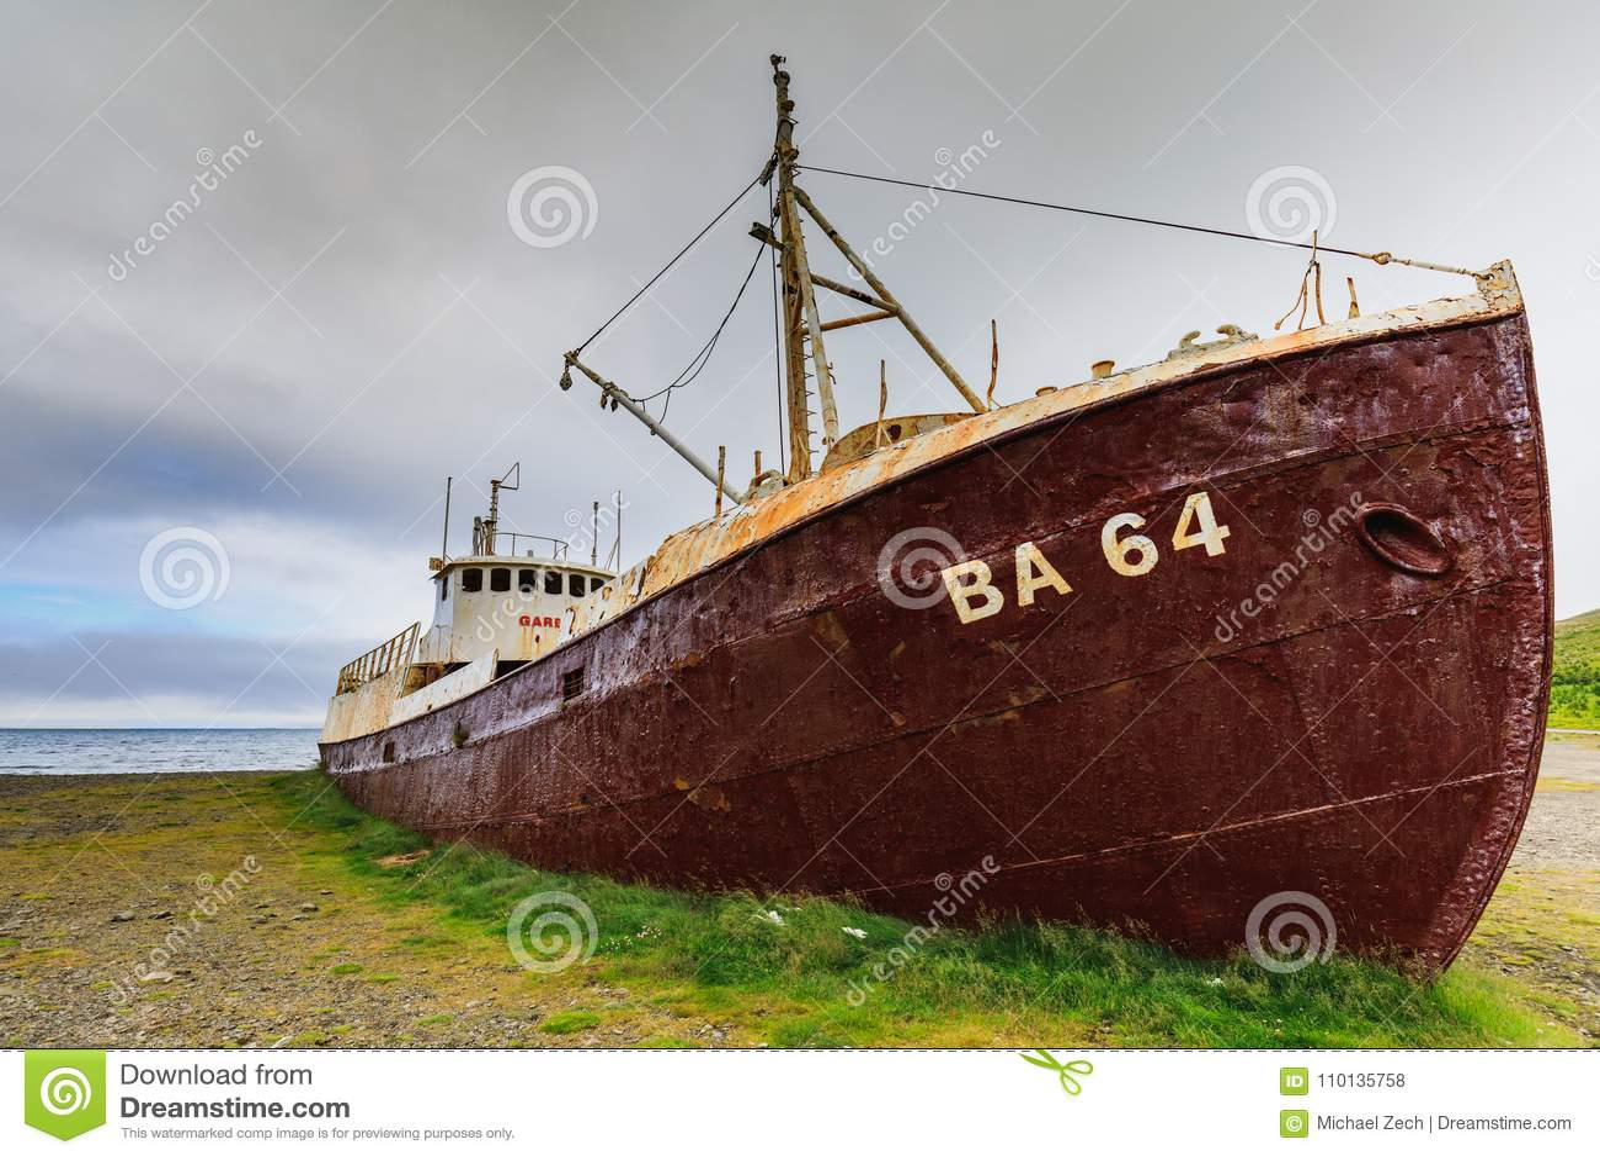 Gardar Ba 64 Ship Wreck In Patrekfjordur Editorial Stock Photo